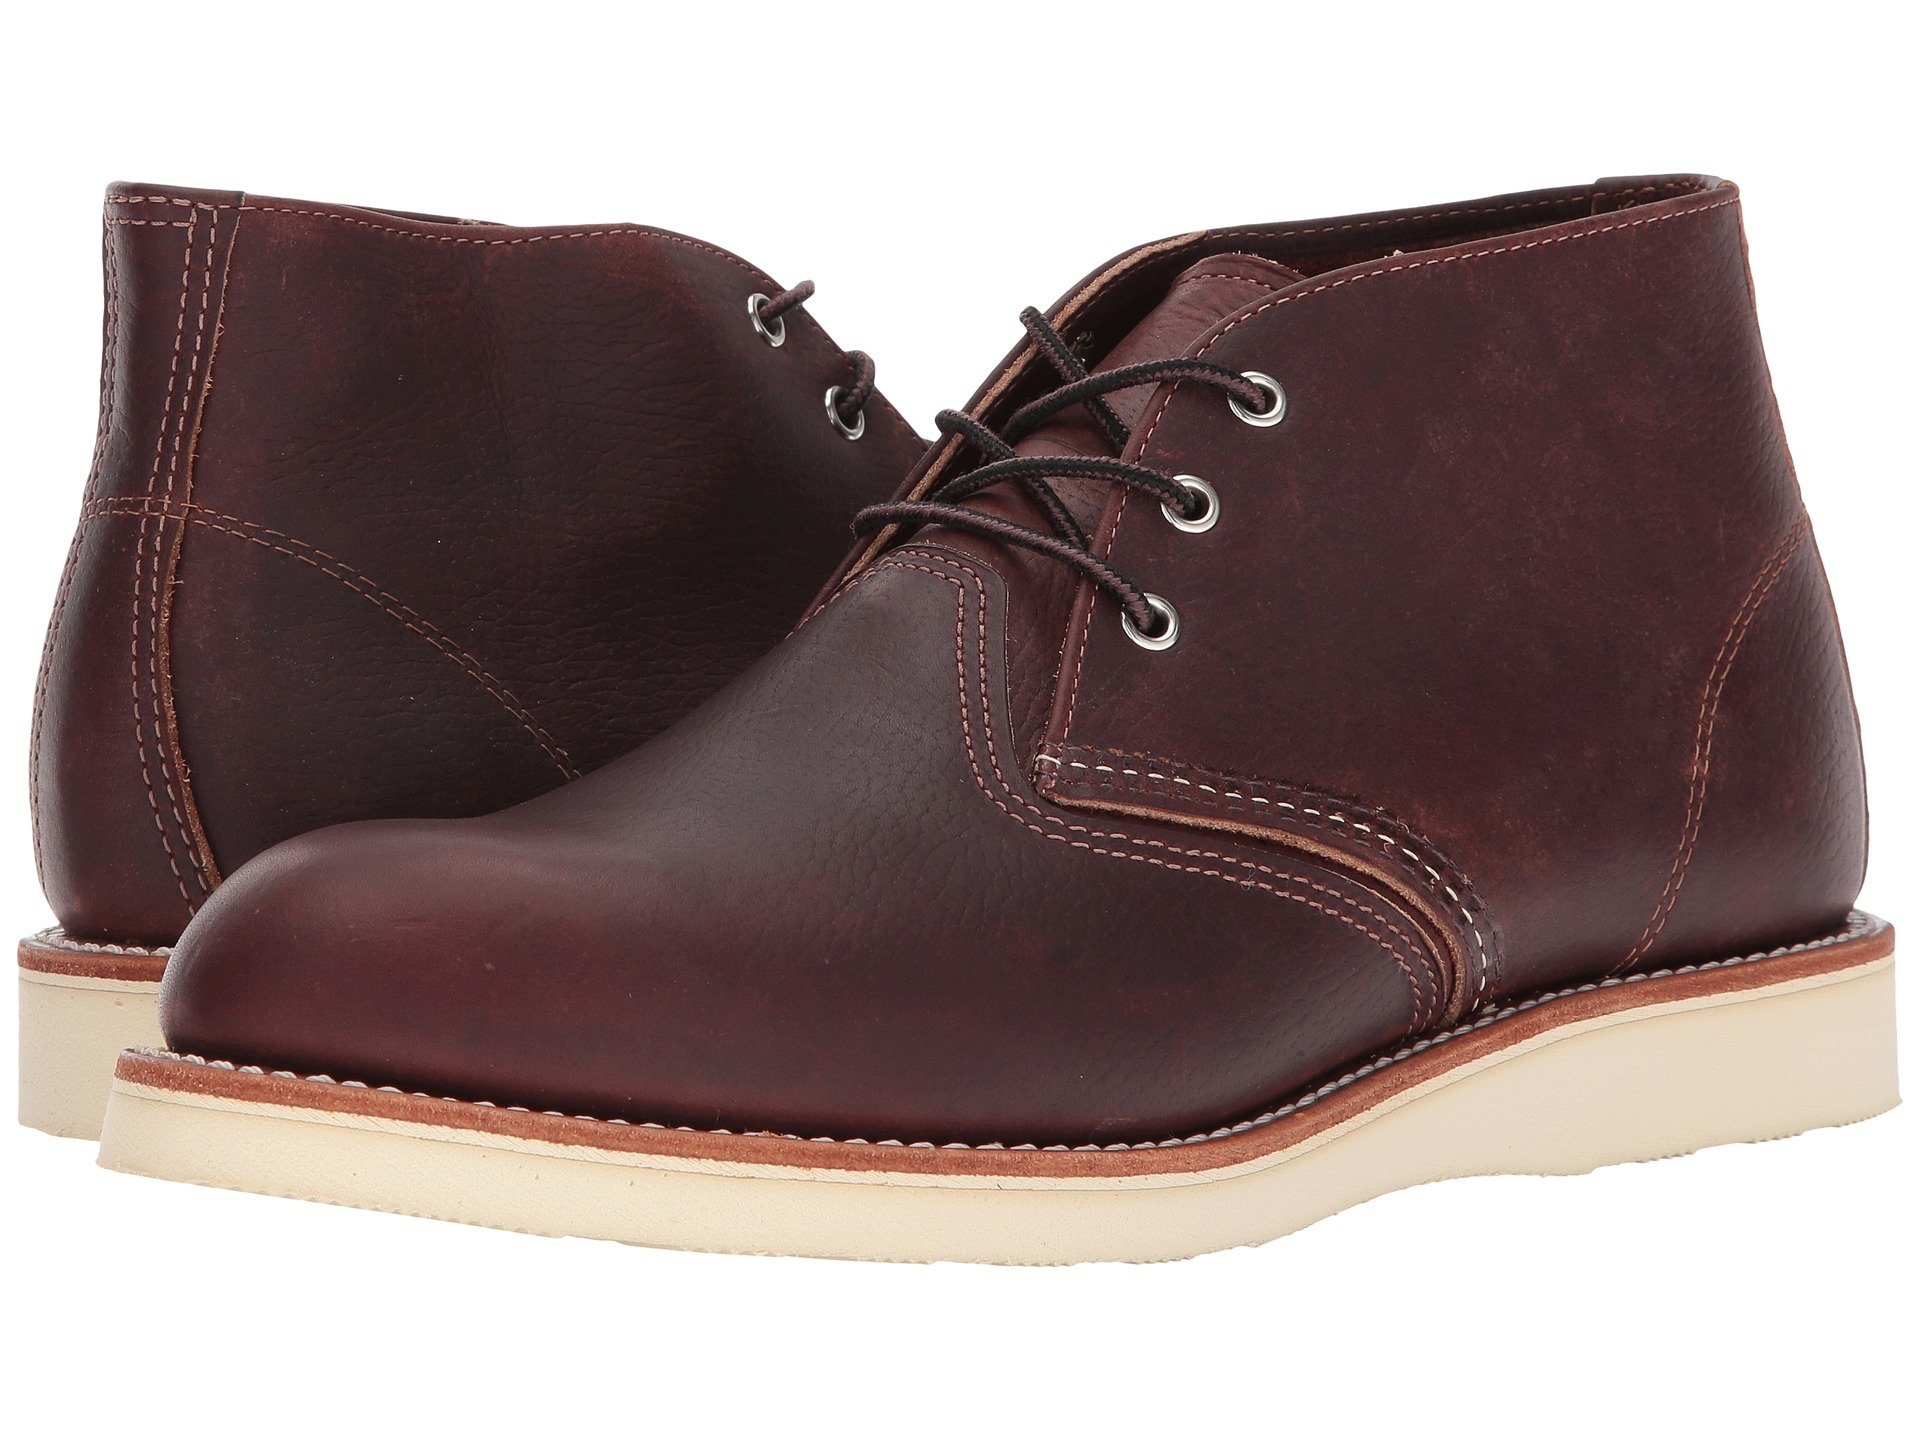 7655b67f9e7 Men s Mahogany Shoes + FREE SHIPPING